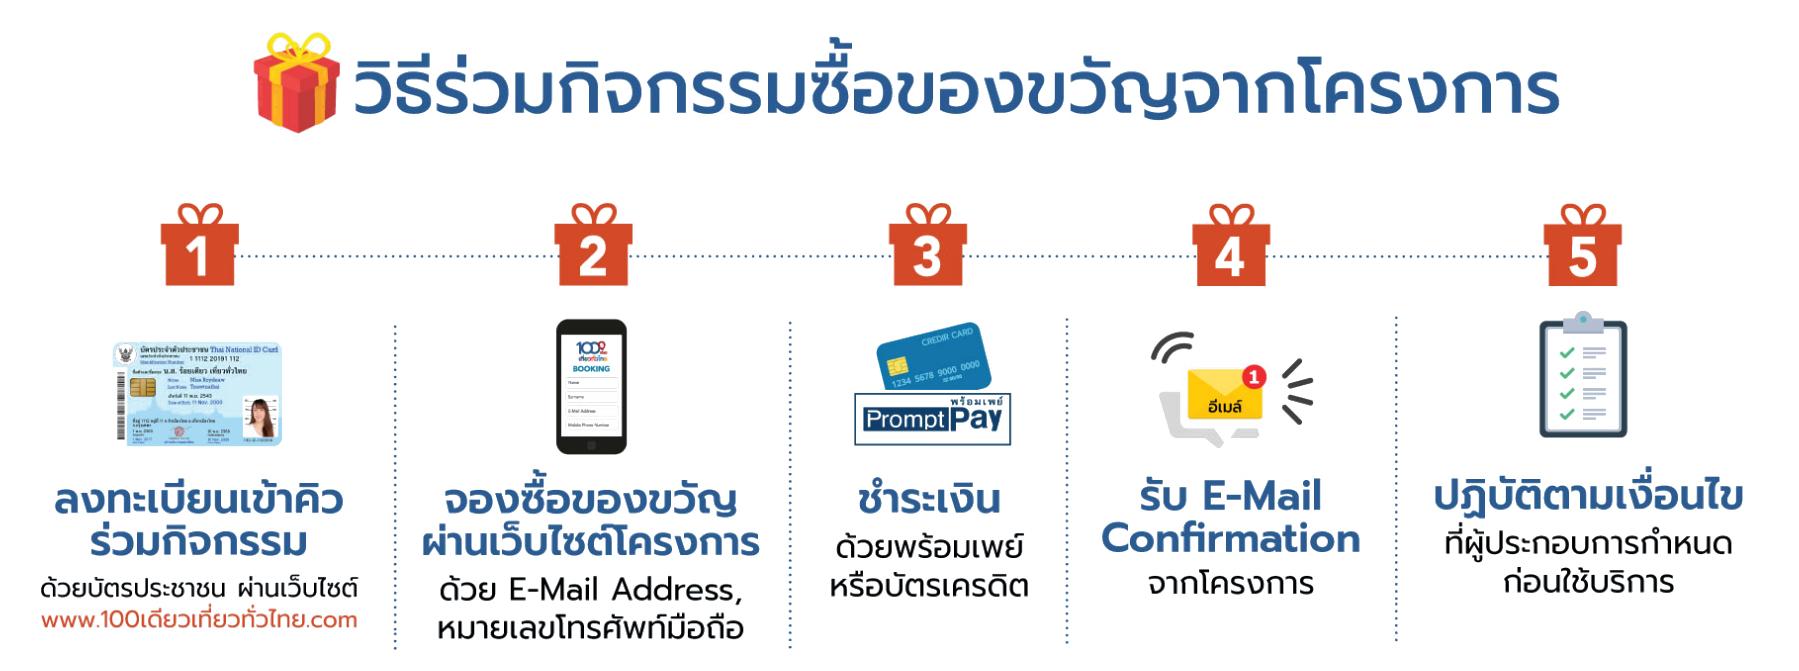 100deaw-tie-tua-thai-procedure ขั้นตอน 100 เดียวเที่ยวทั่วไทย